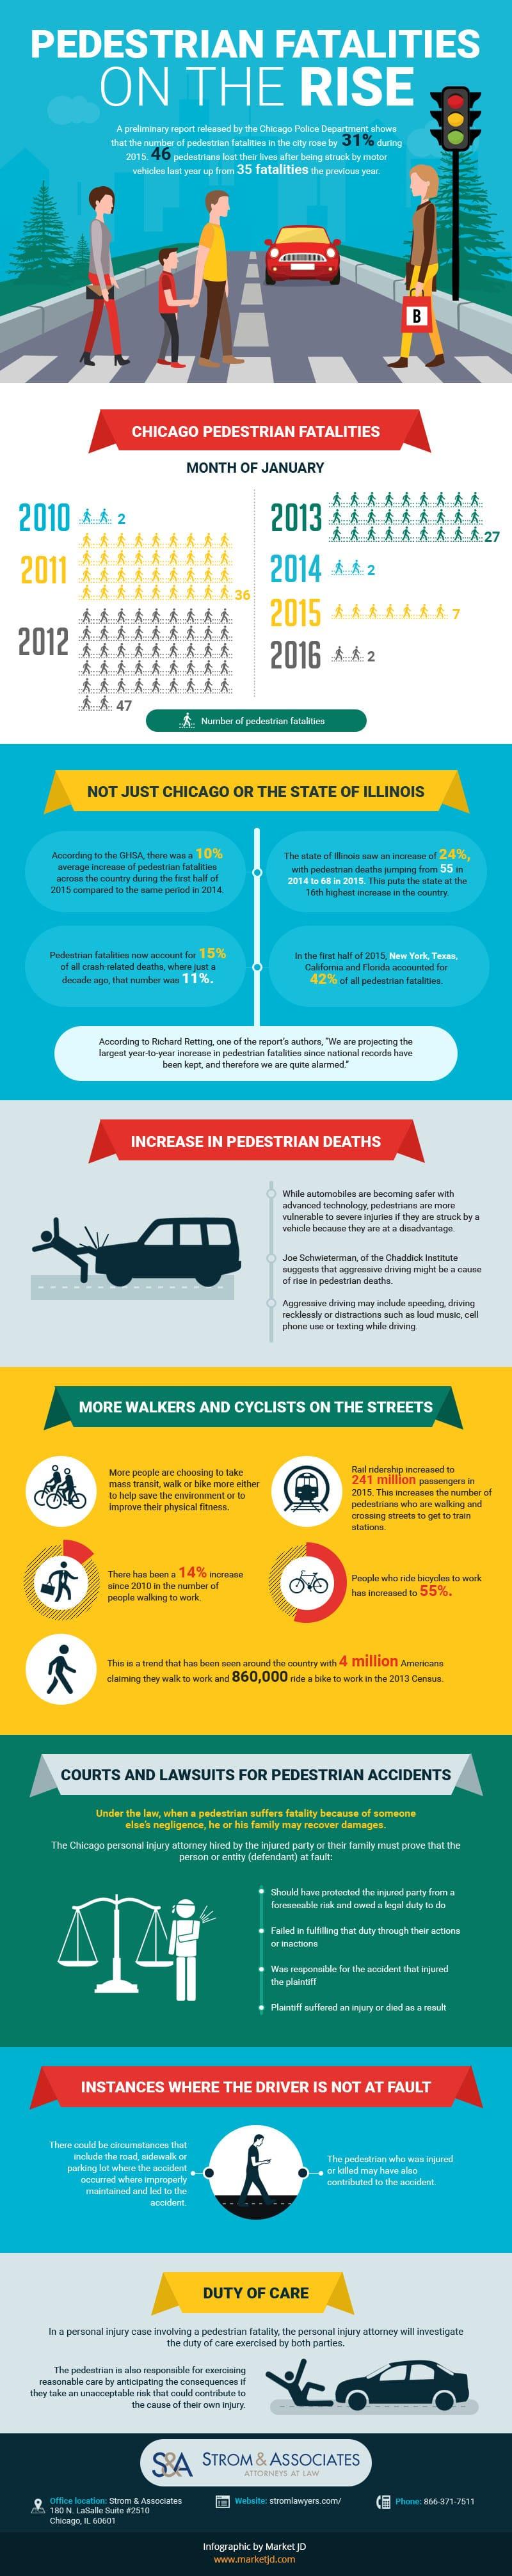 Pedestrian fatalities infographic